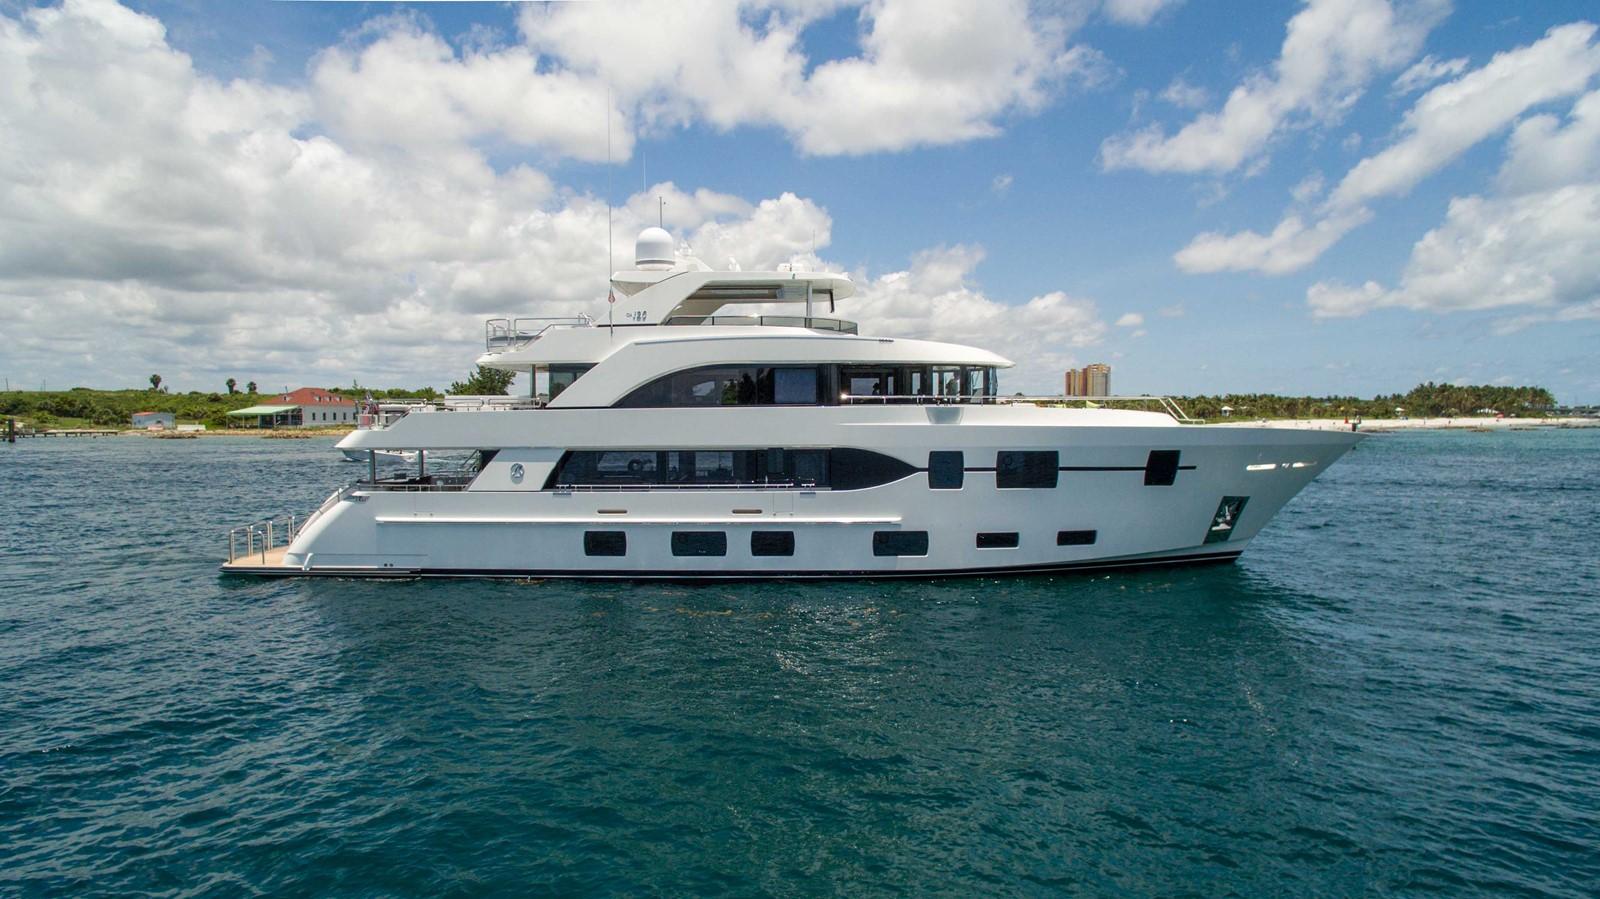 2017 OCEAN ALEXANDER Tri Deck Motor Yacht For Sale